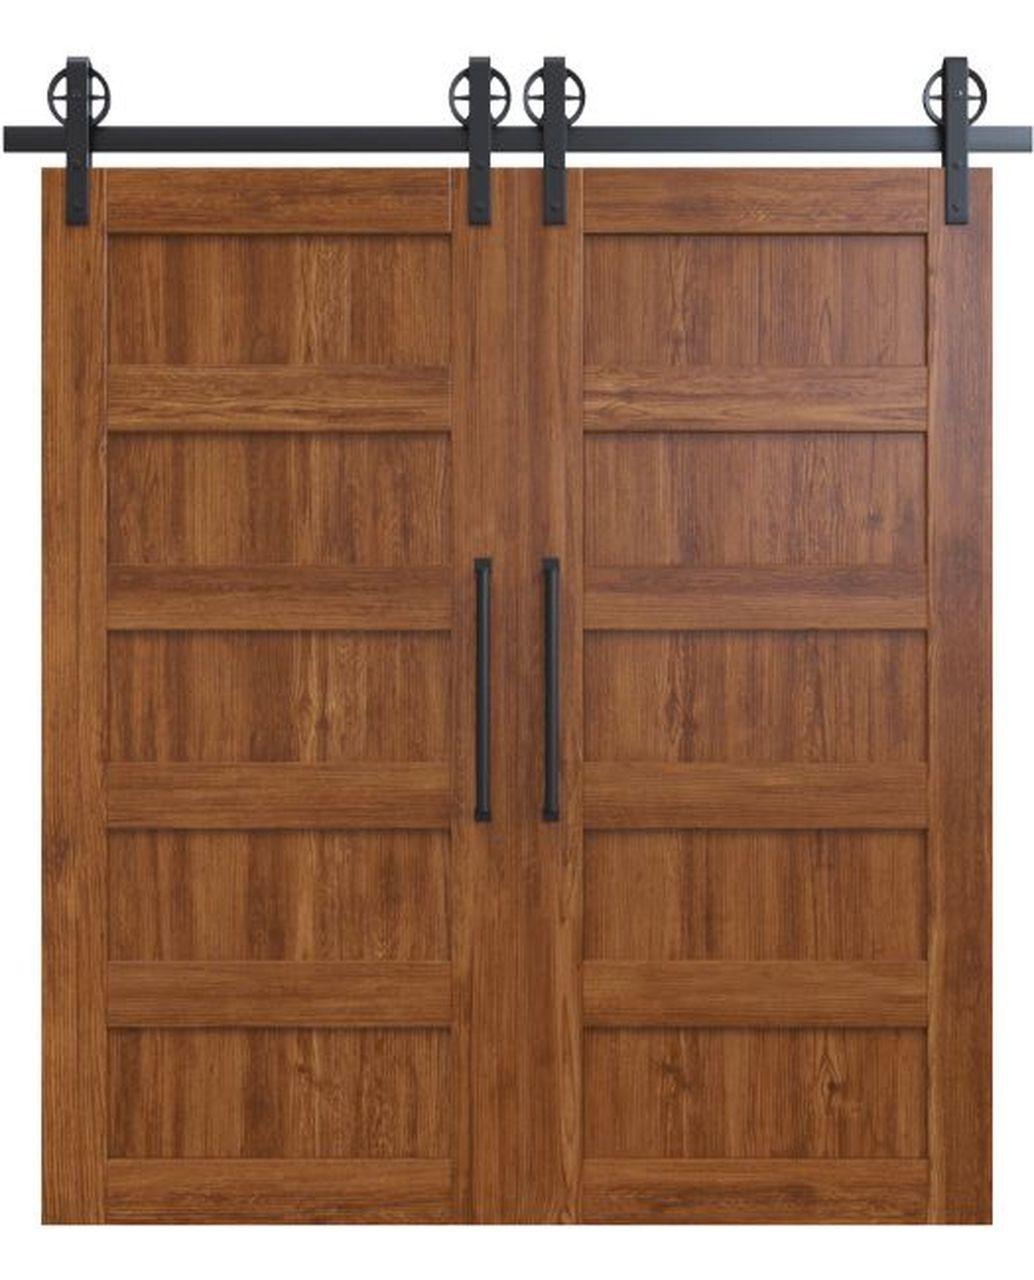 stained wood 5 panel double barn door